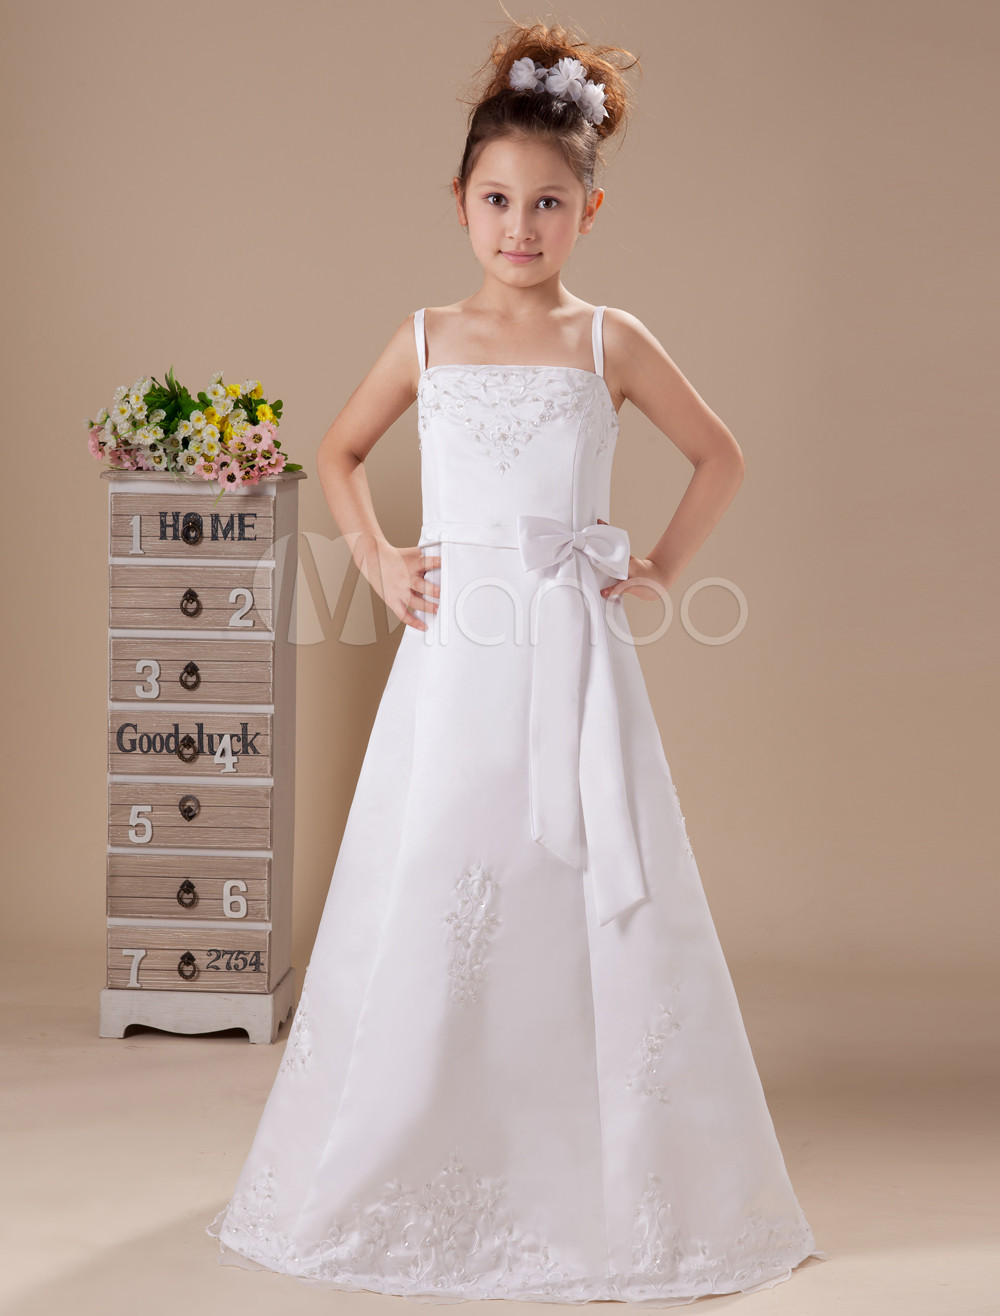 White Embroidery Satin Flower Girl Dress